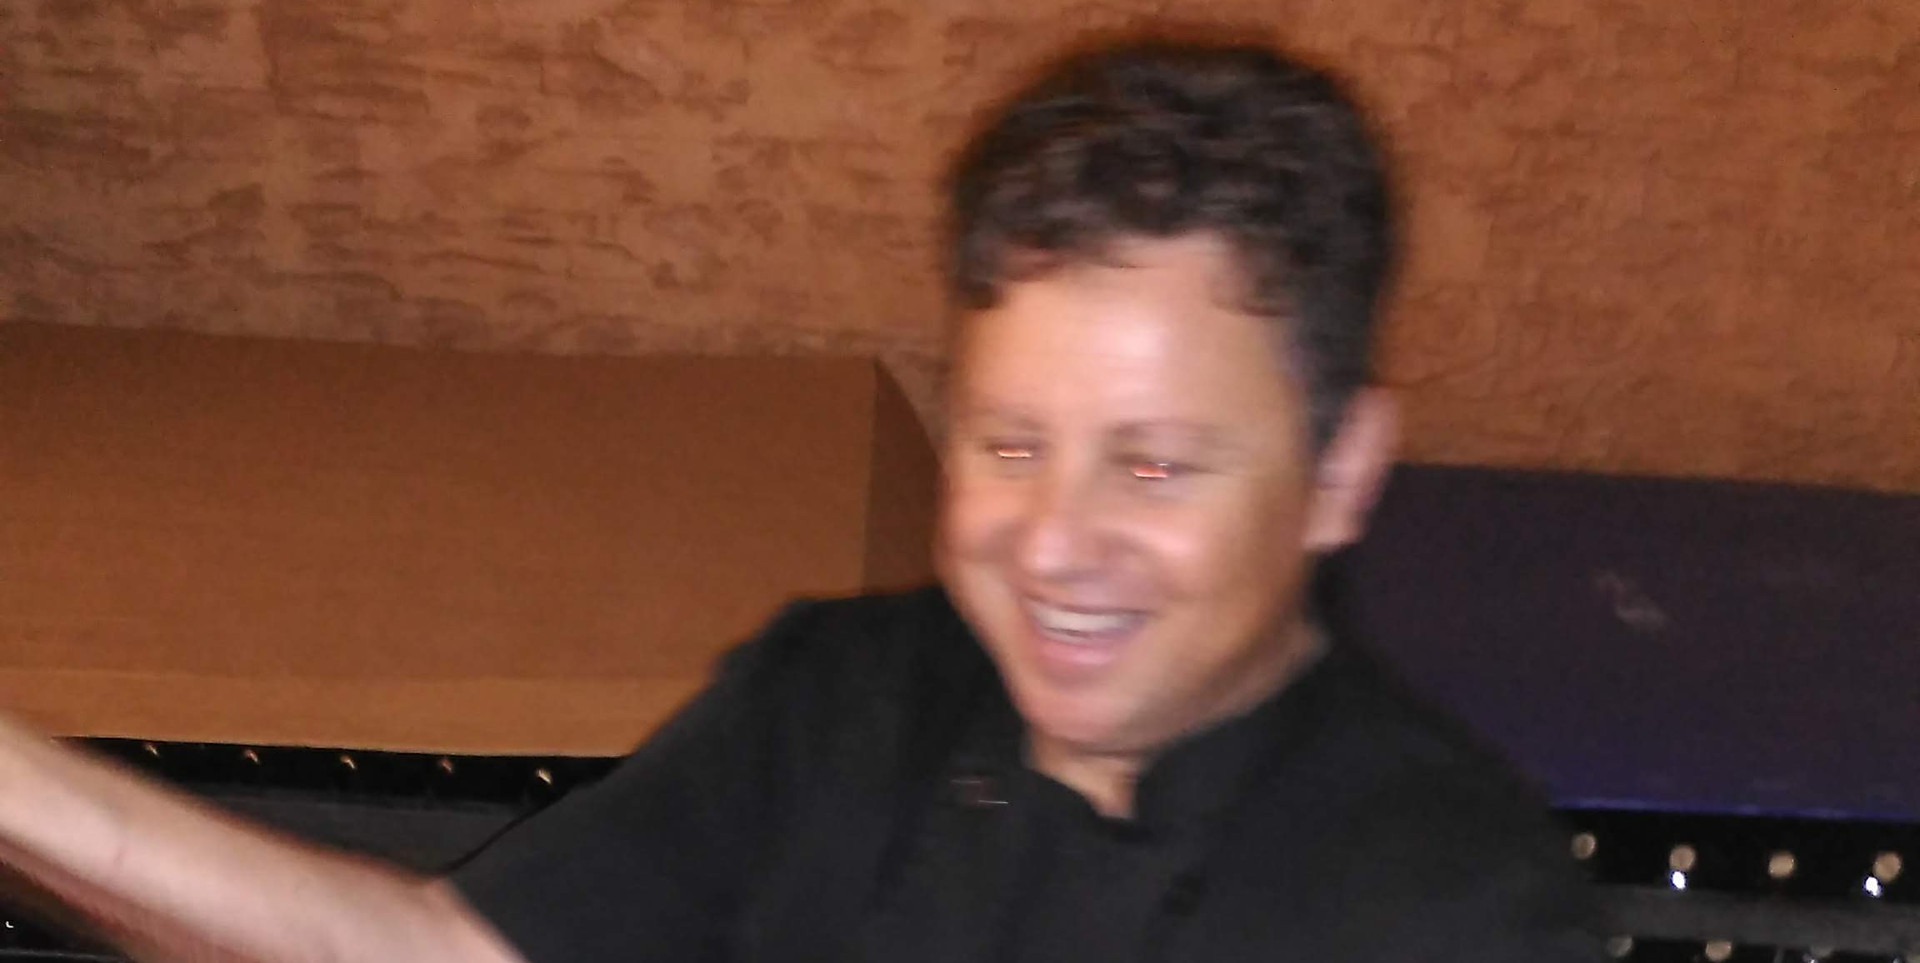 Alberto Madruga